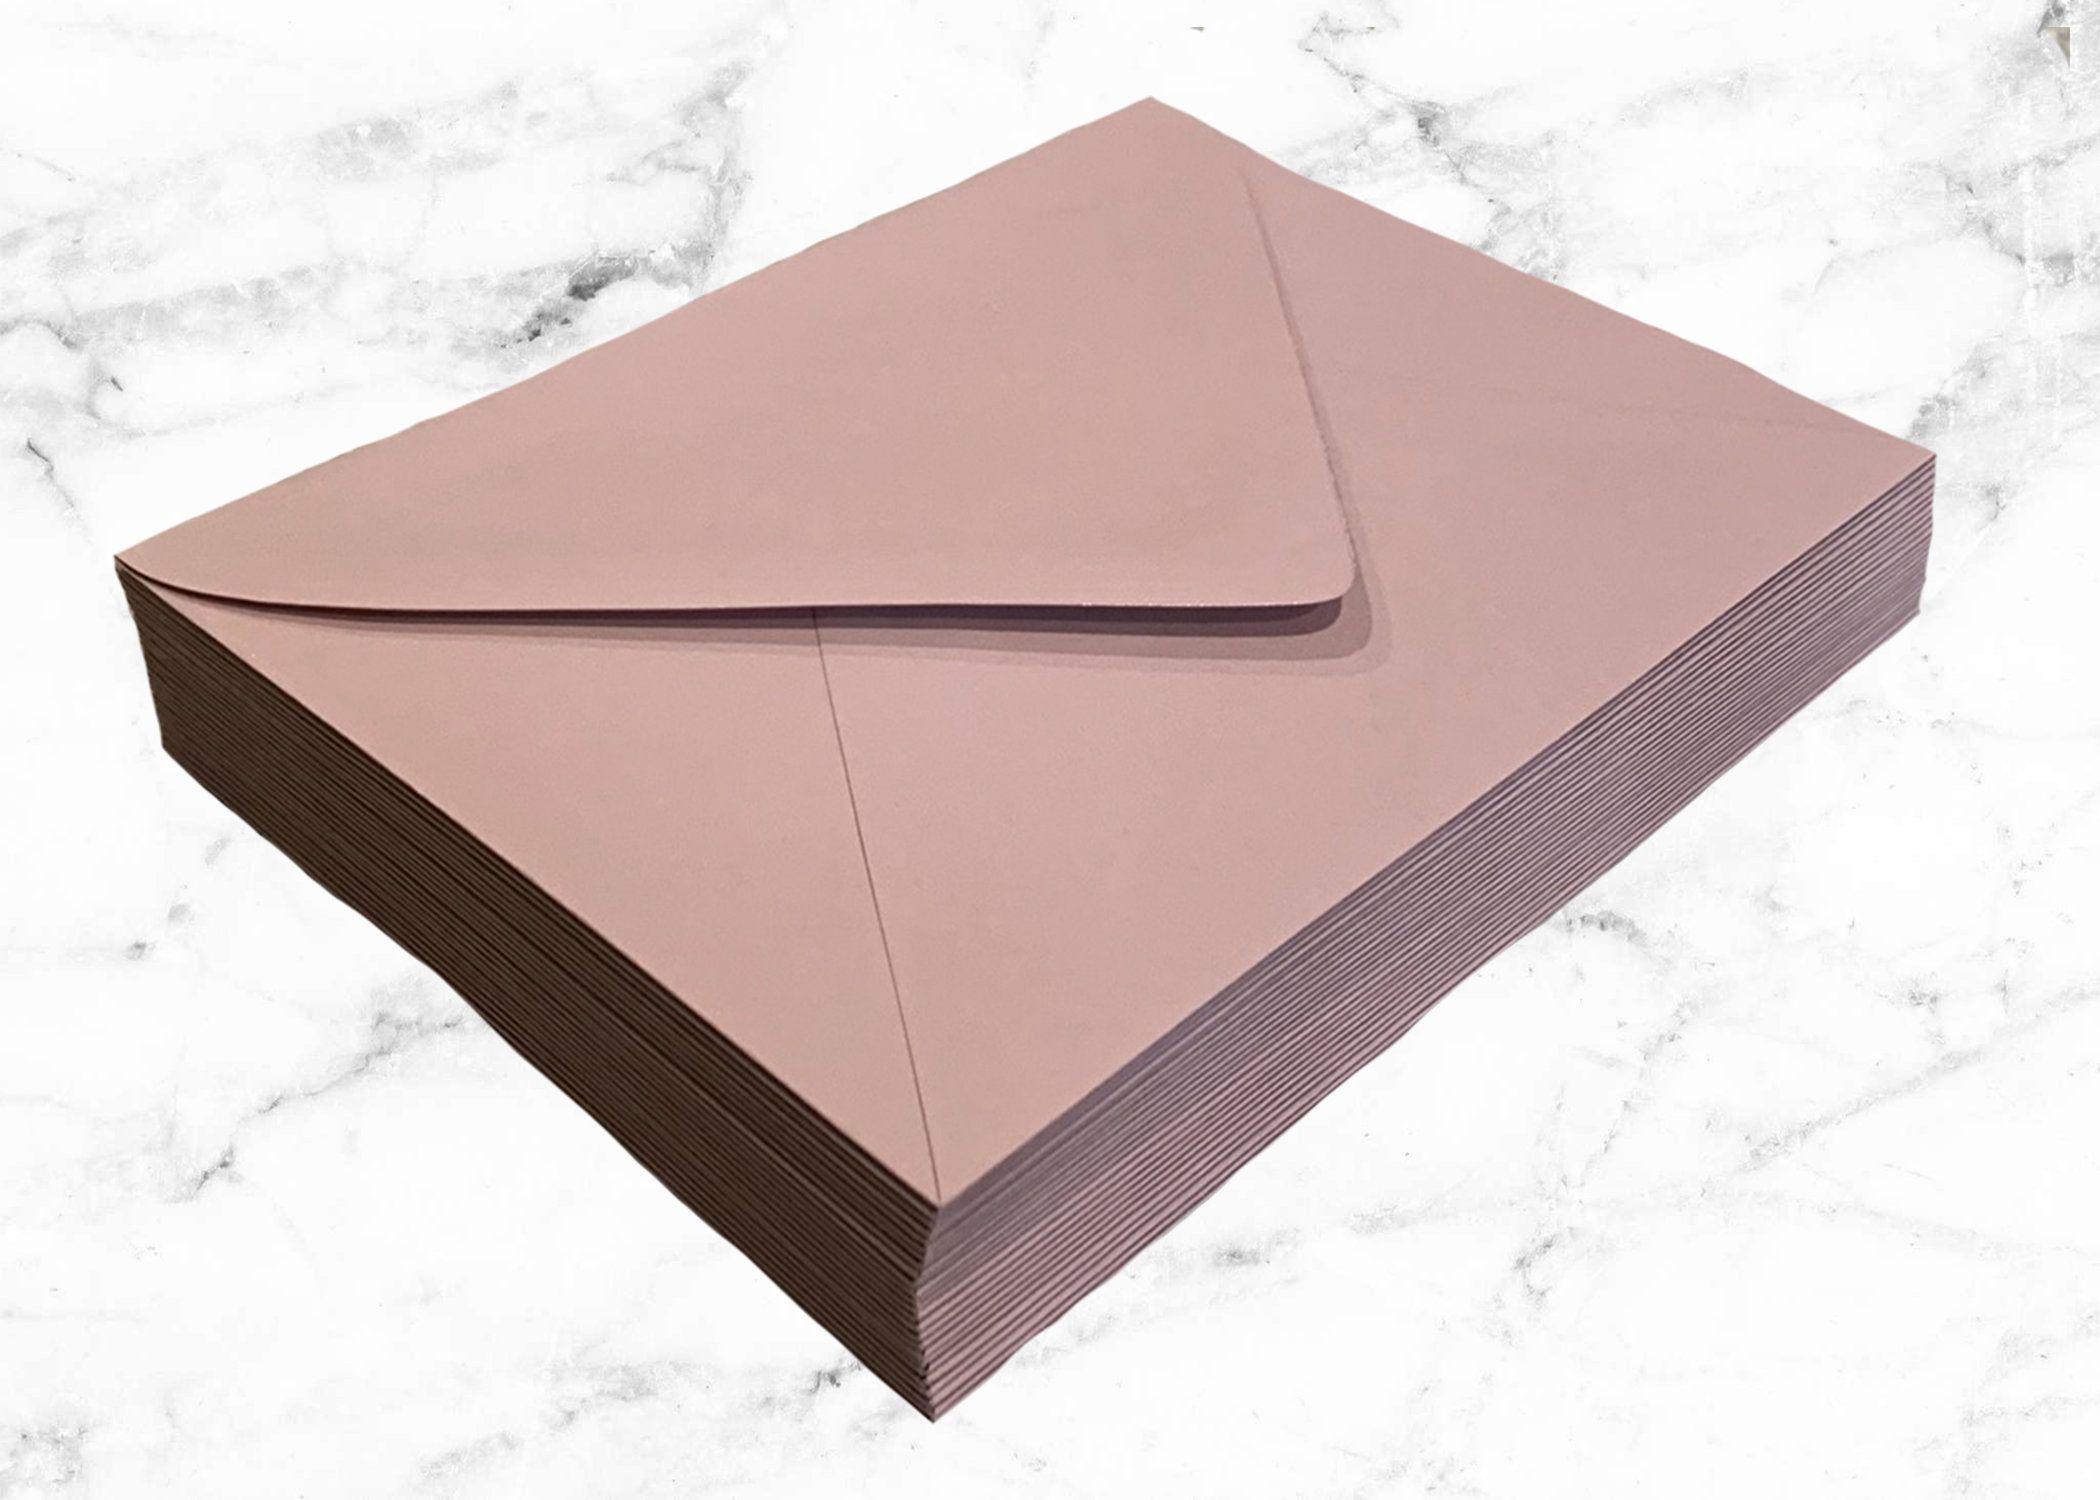 25 rose pink a7 envelopes dusty pink envelope pointed